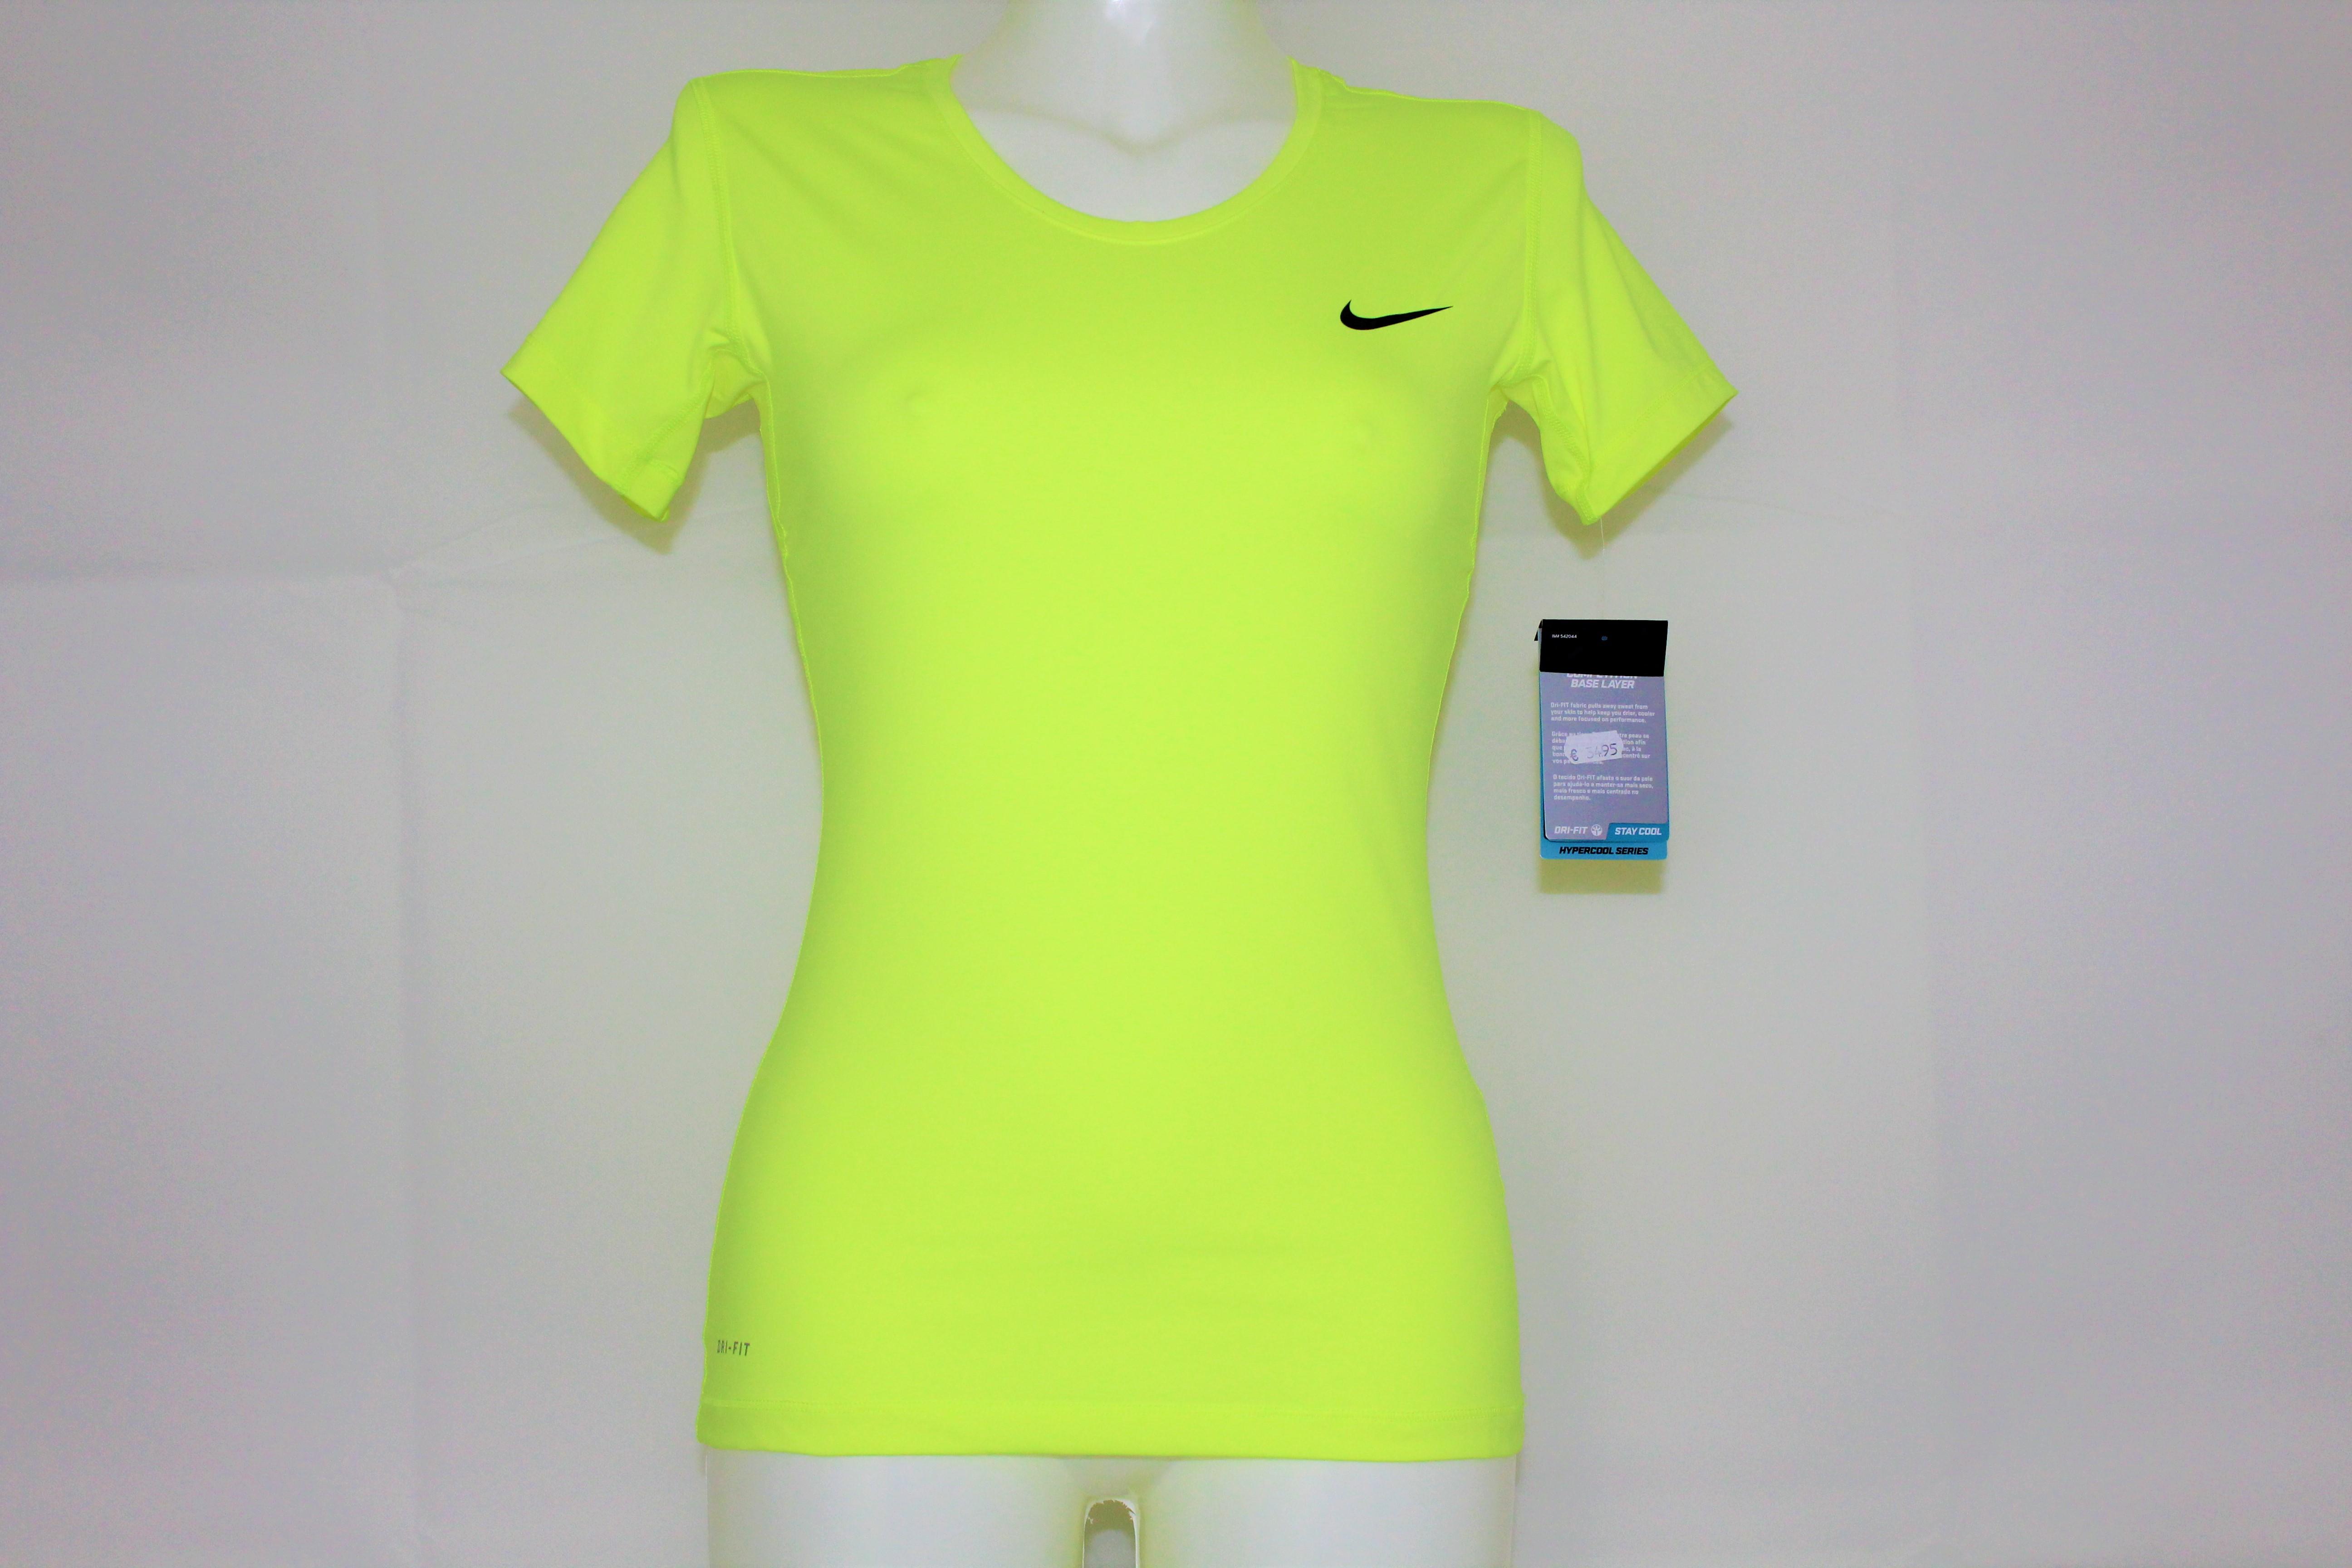 Nike Damen Tennis Court Pro Shirt neongelb